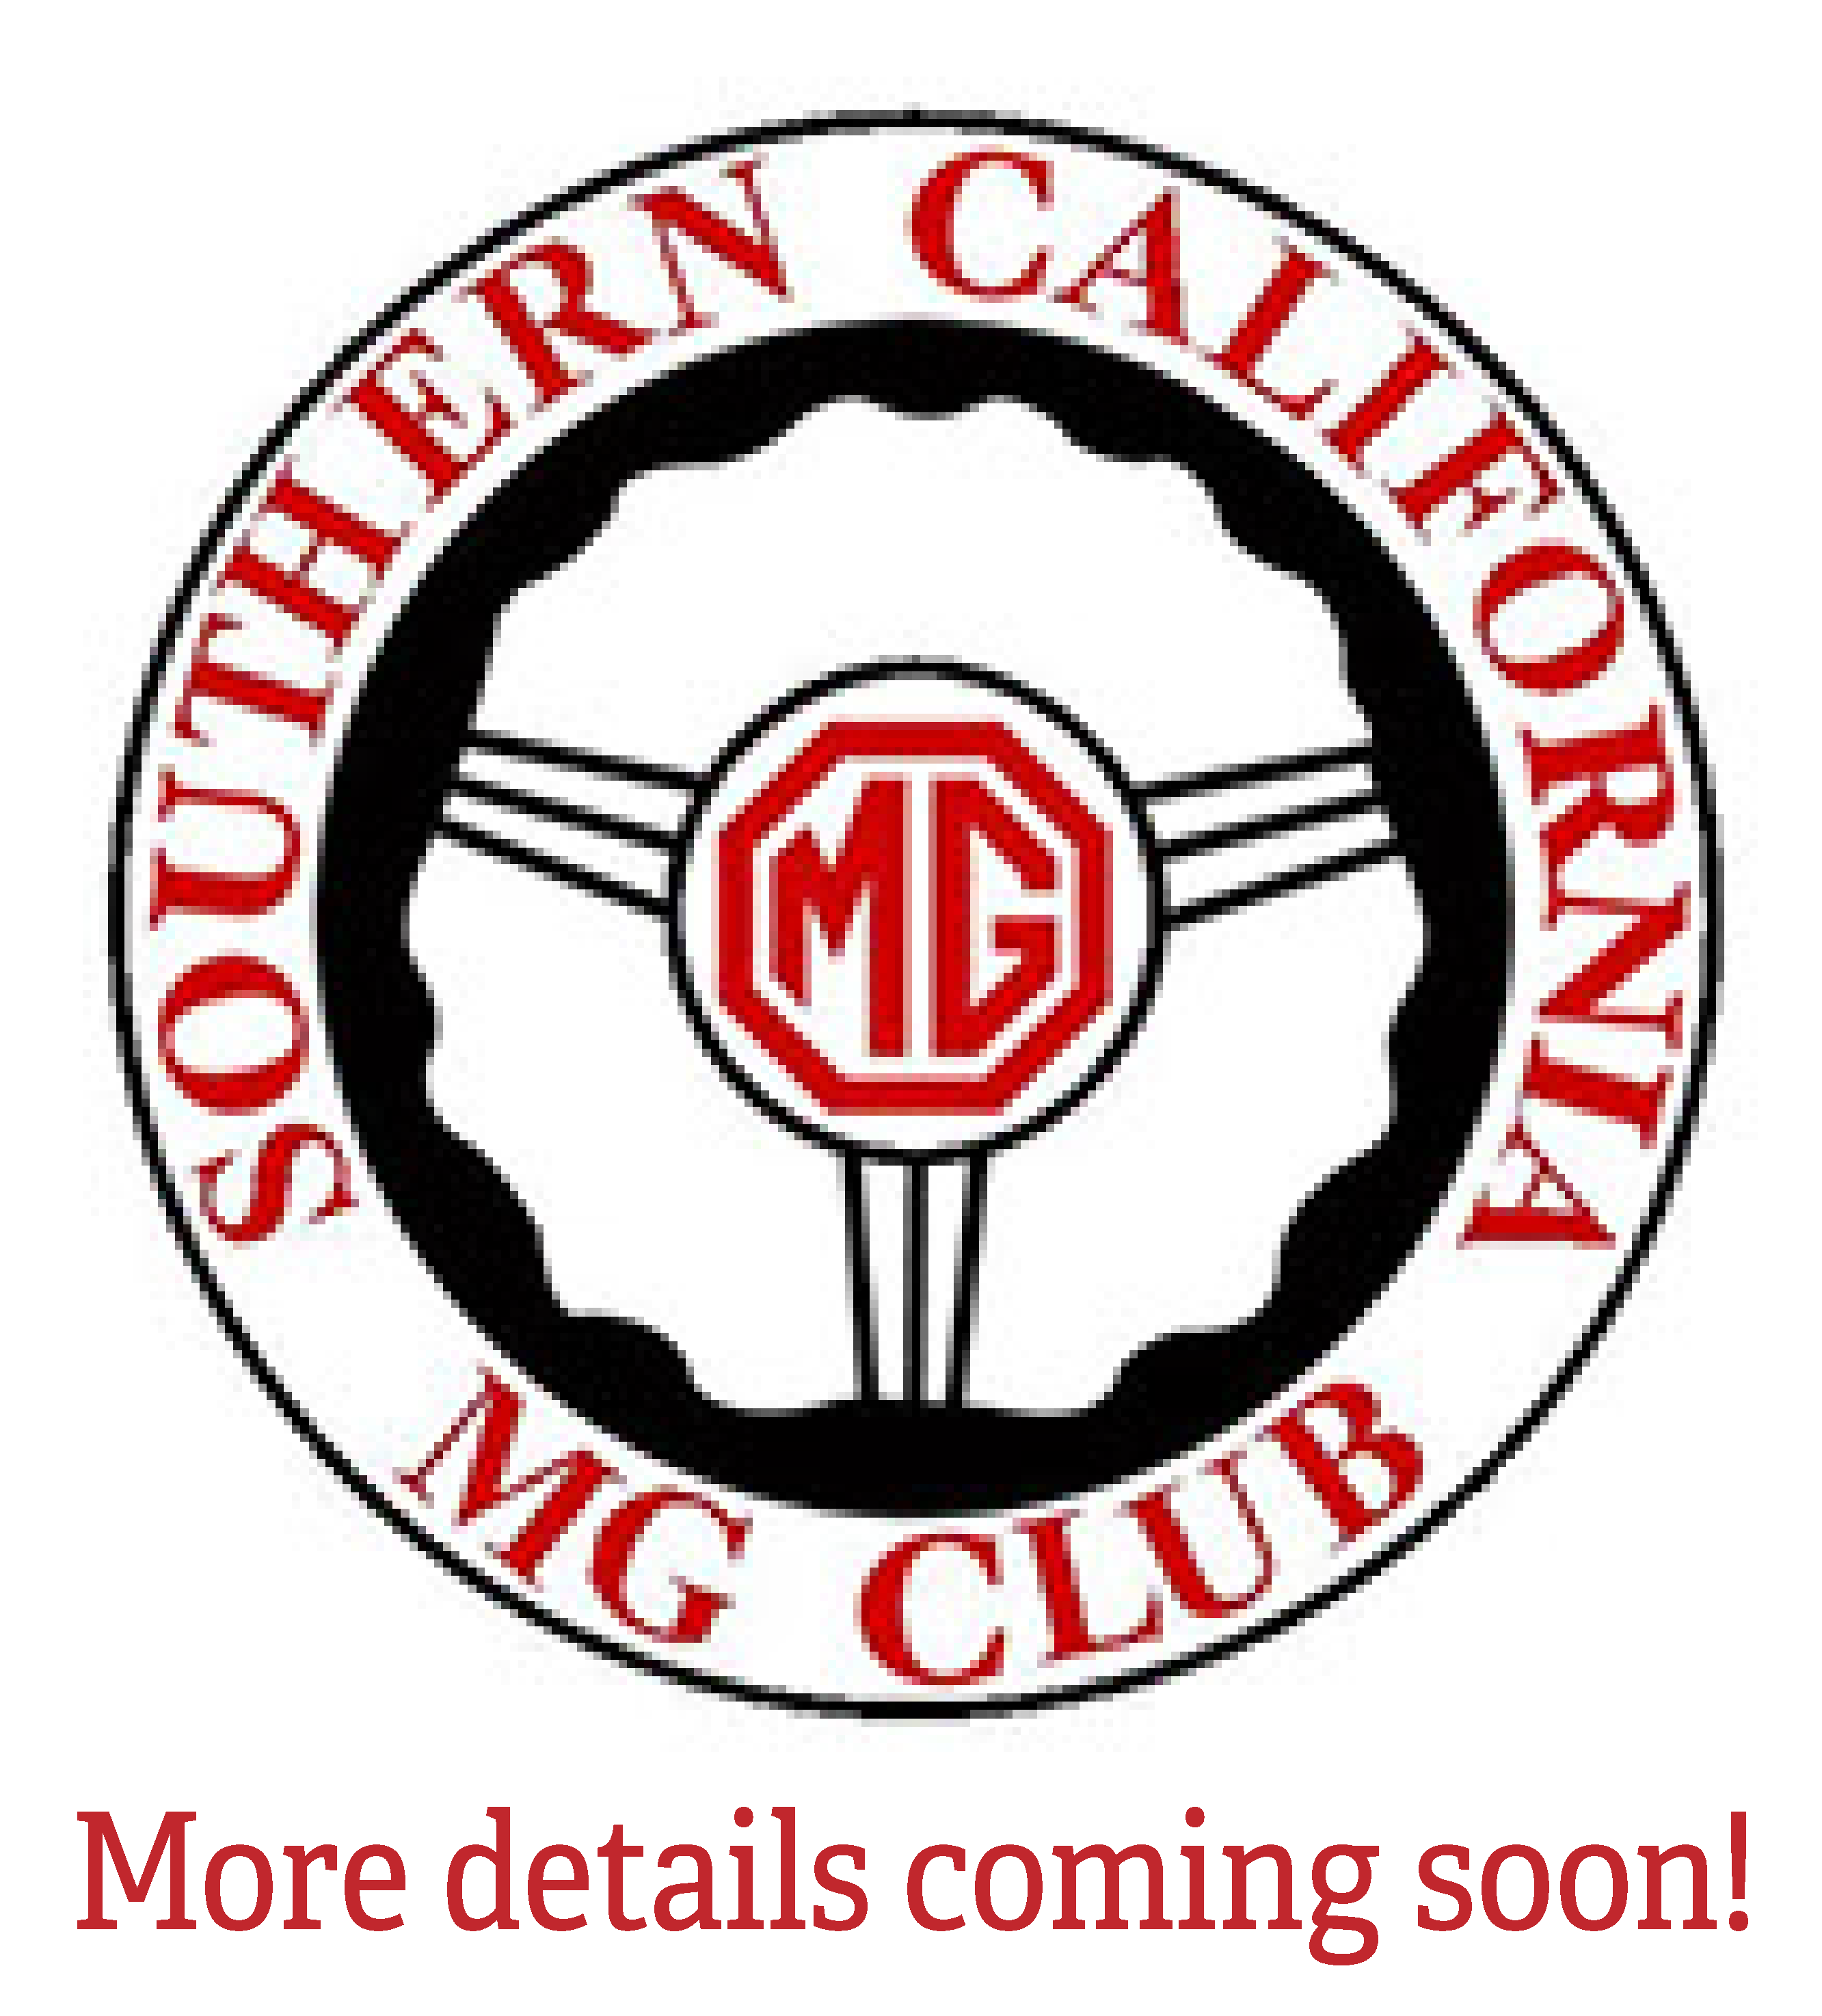 MG Club Car Show